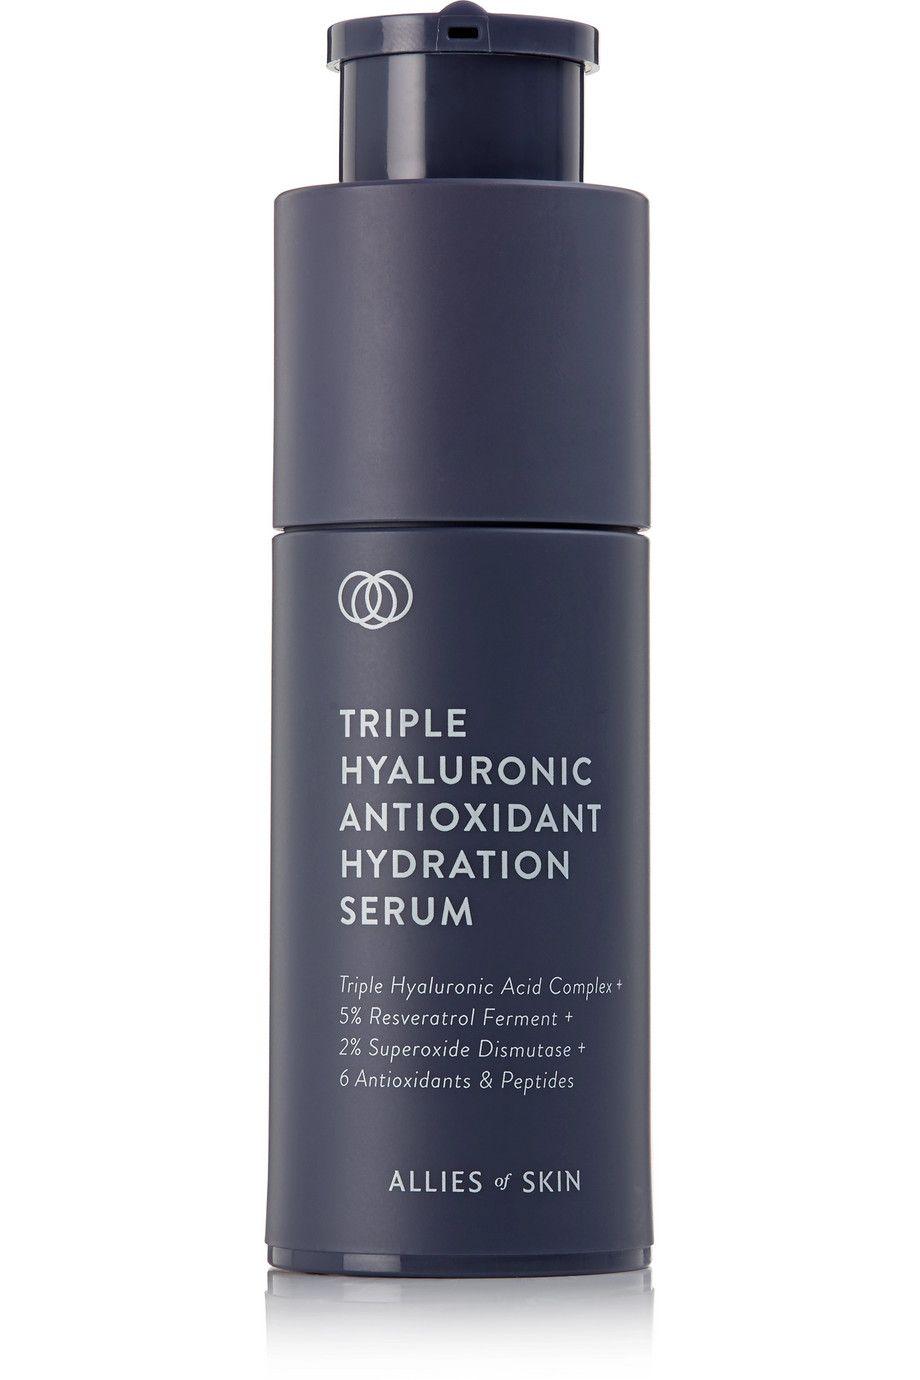 Triple Hyaluronic Antioxidant Hydration Serum